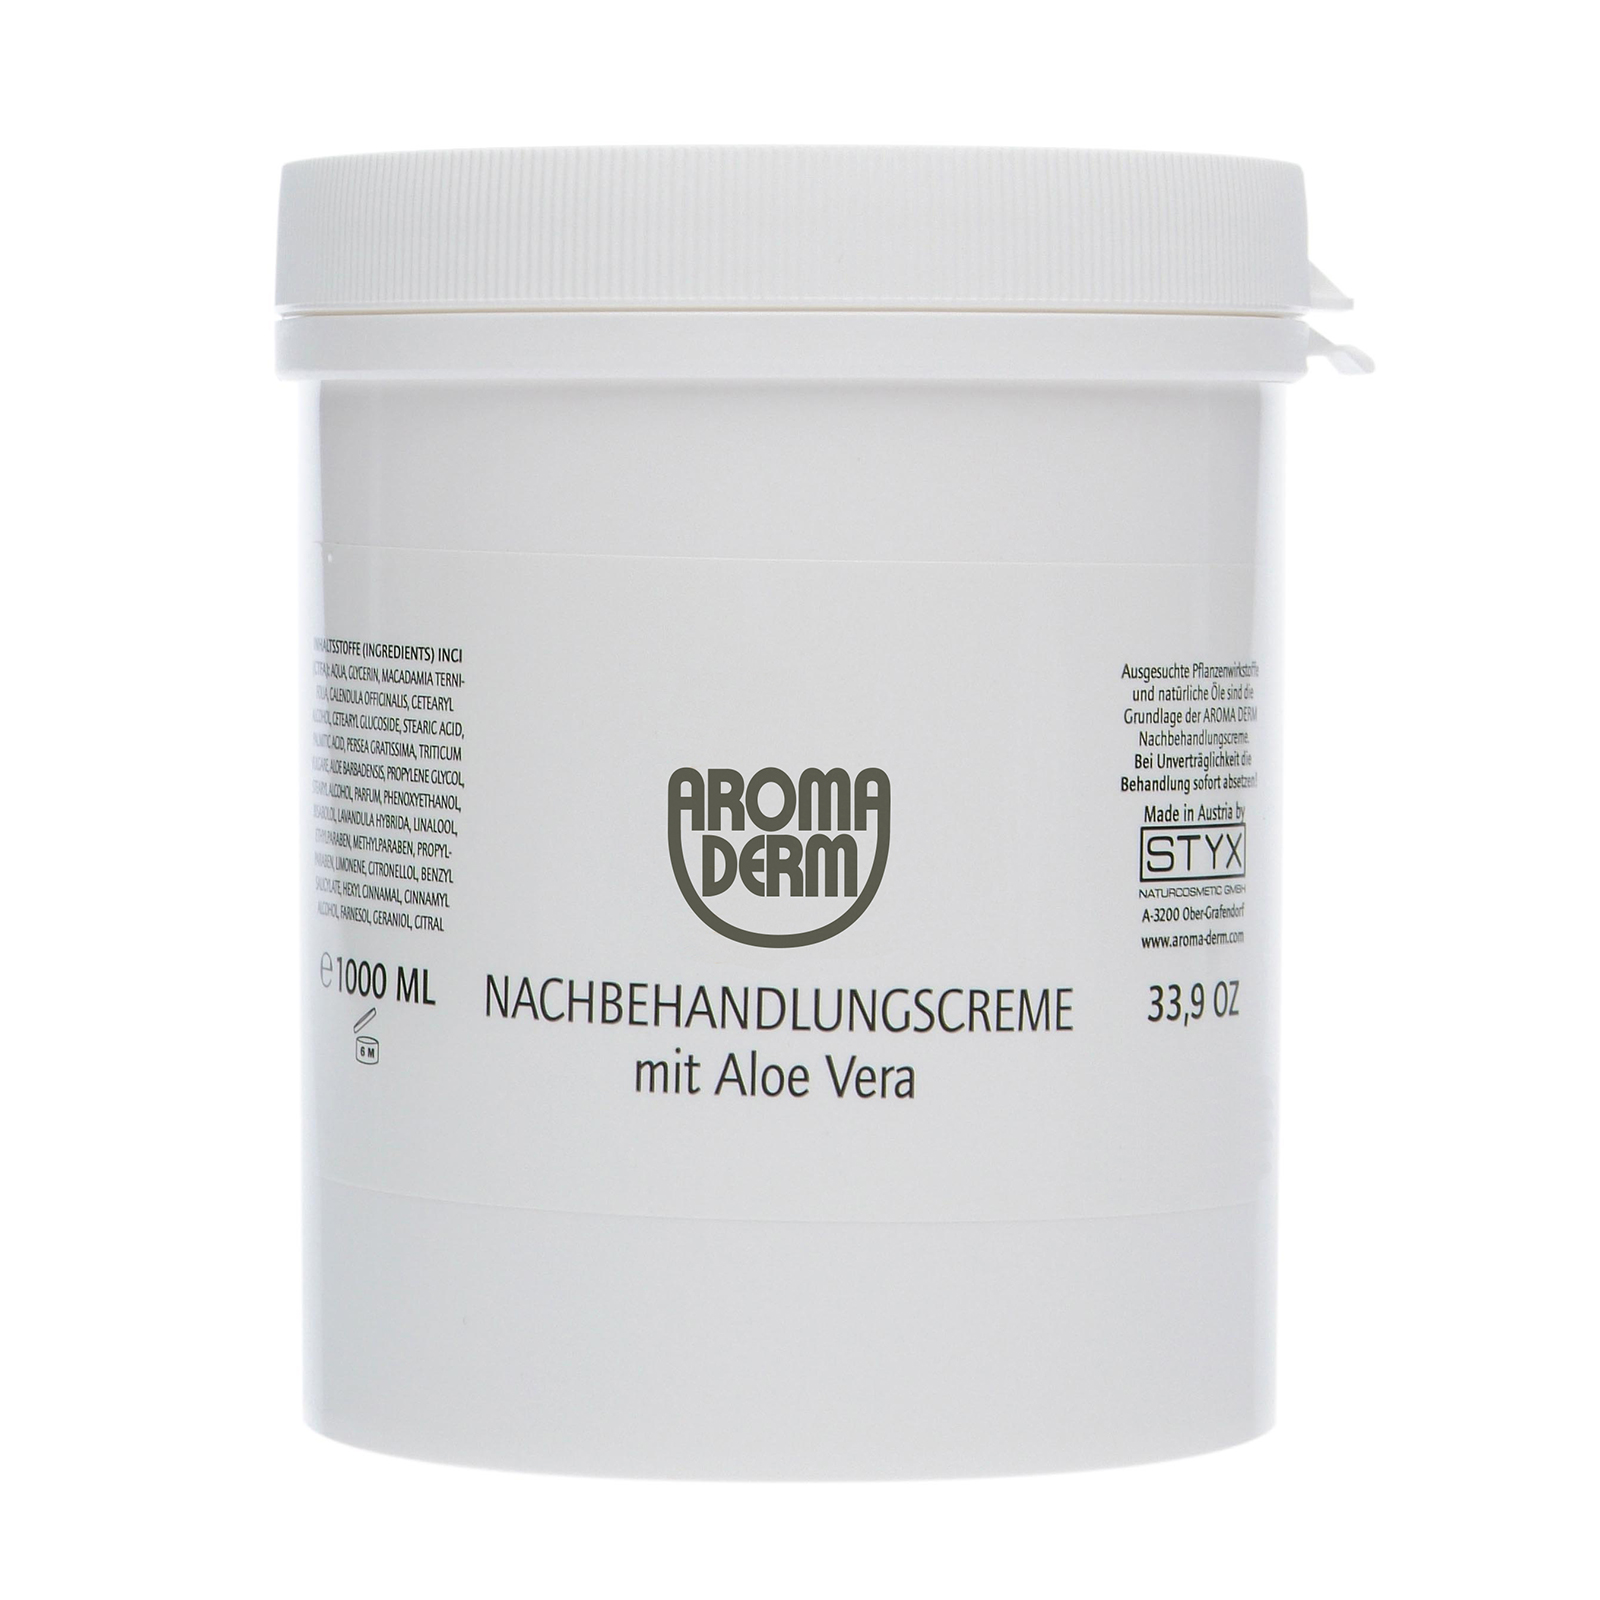 BW-Nachbehandlungscreme-Aloe-Vera-1000-ml-NEU